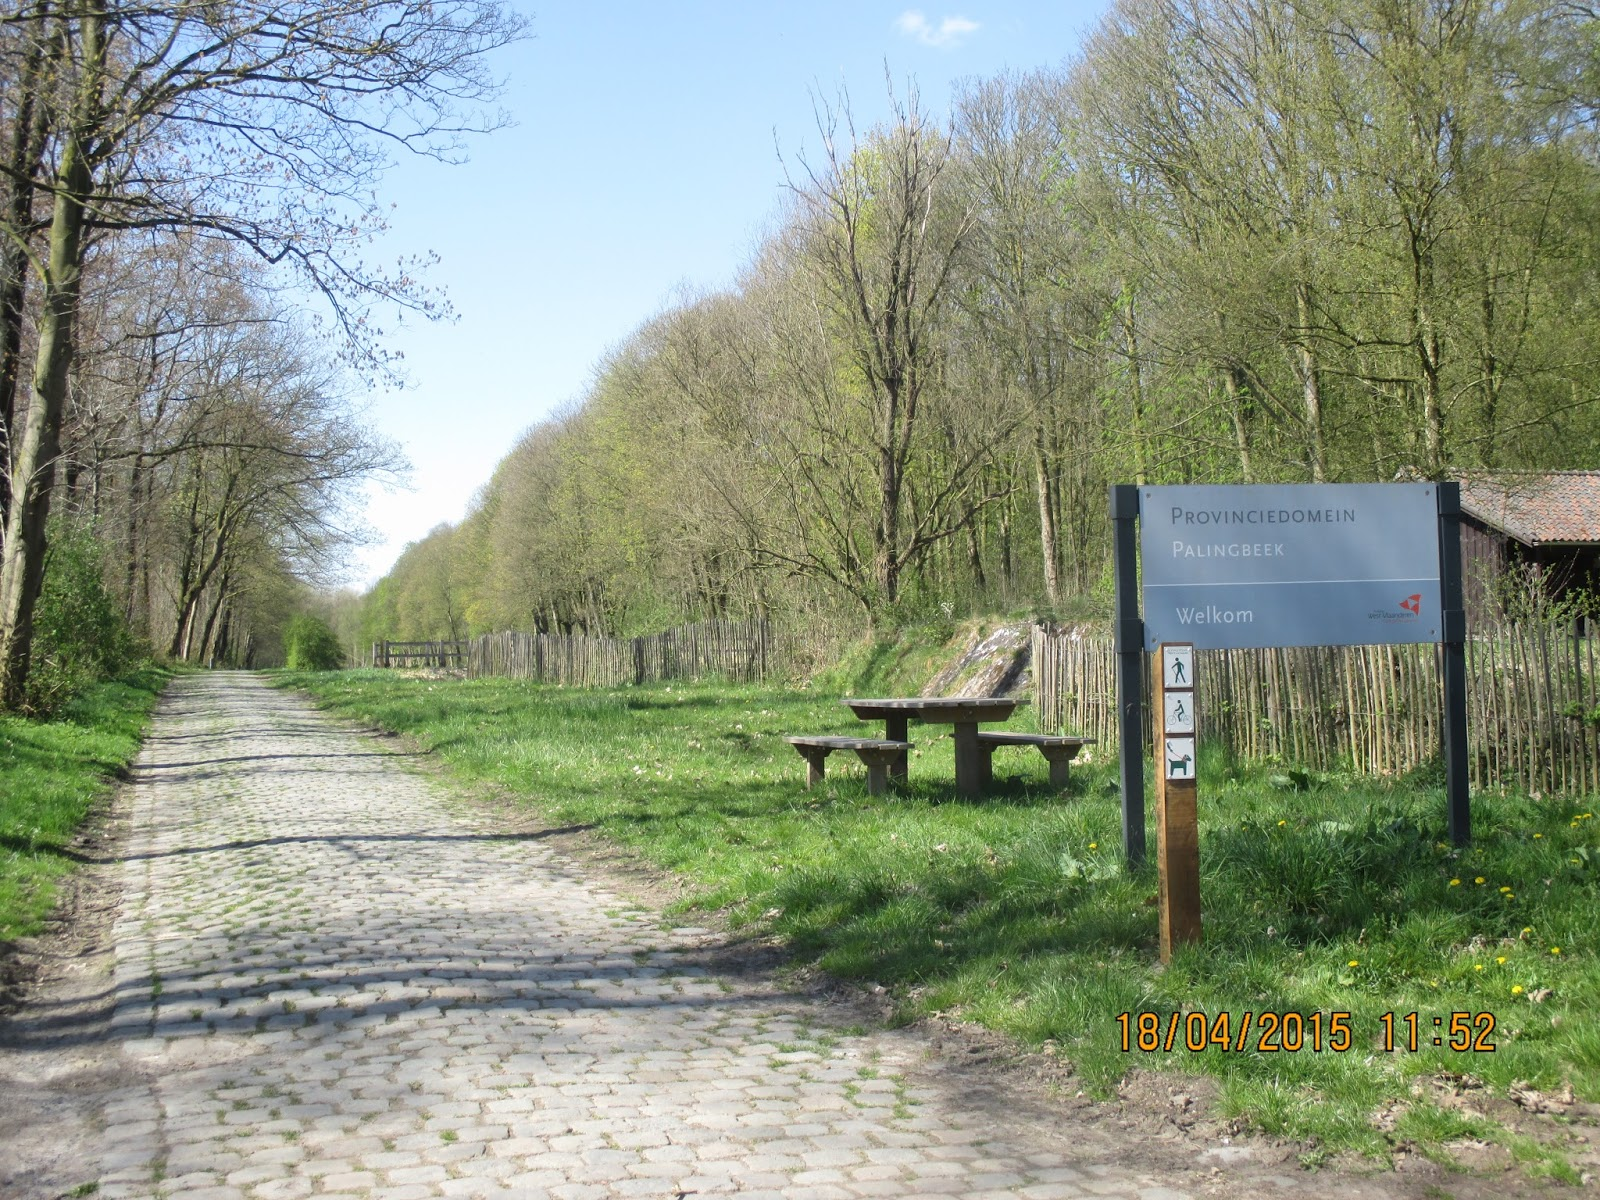 Palingbeek